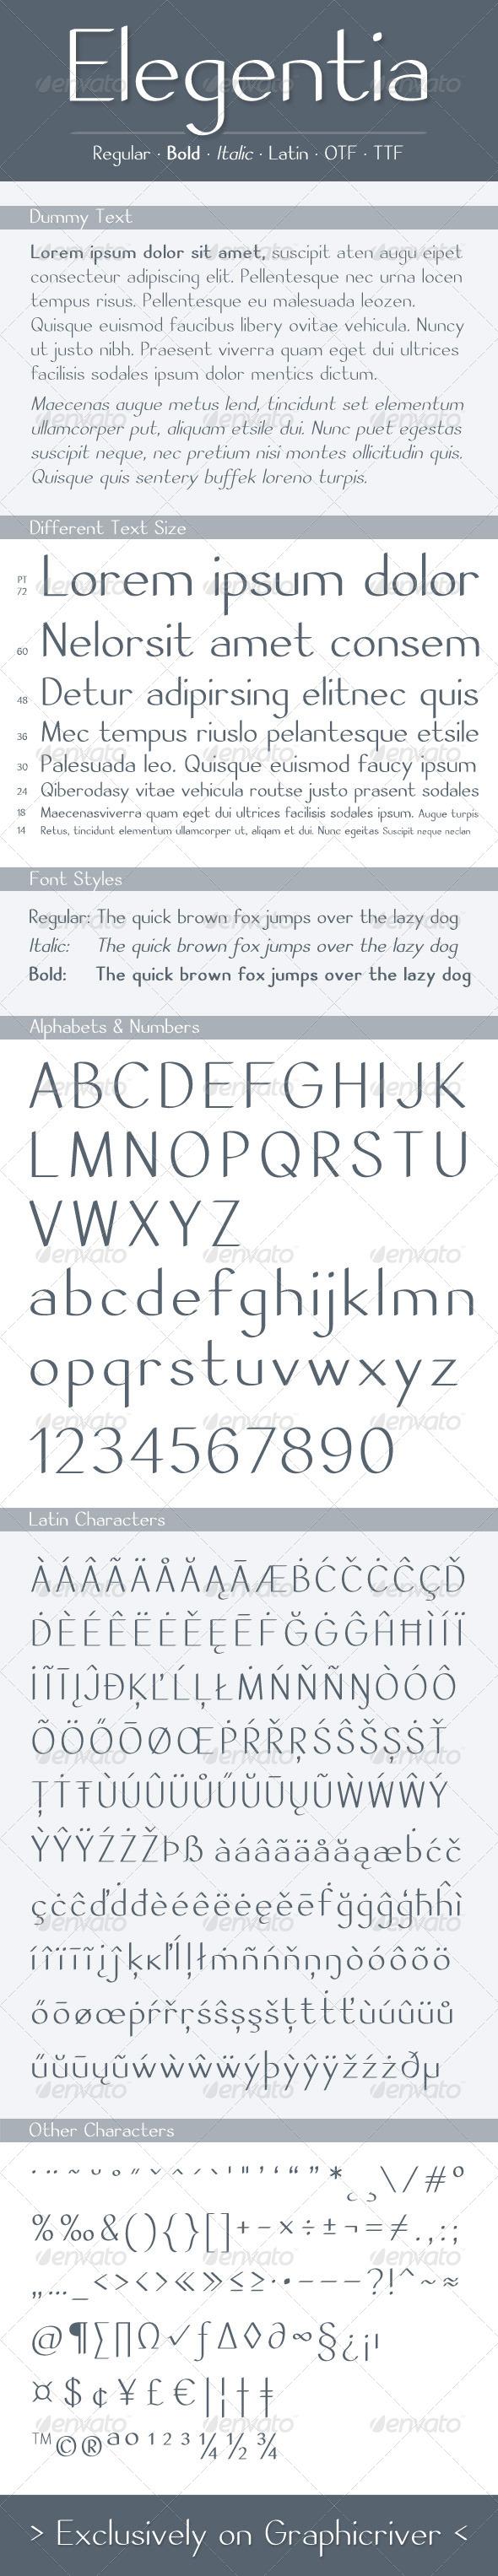 GraphicRiver Elegentia Font 7478569